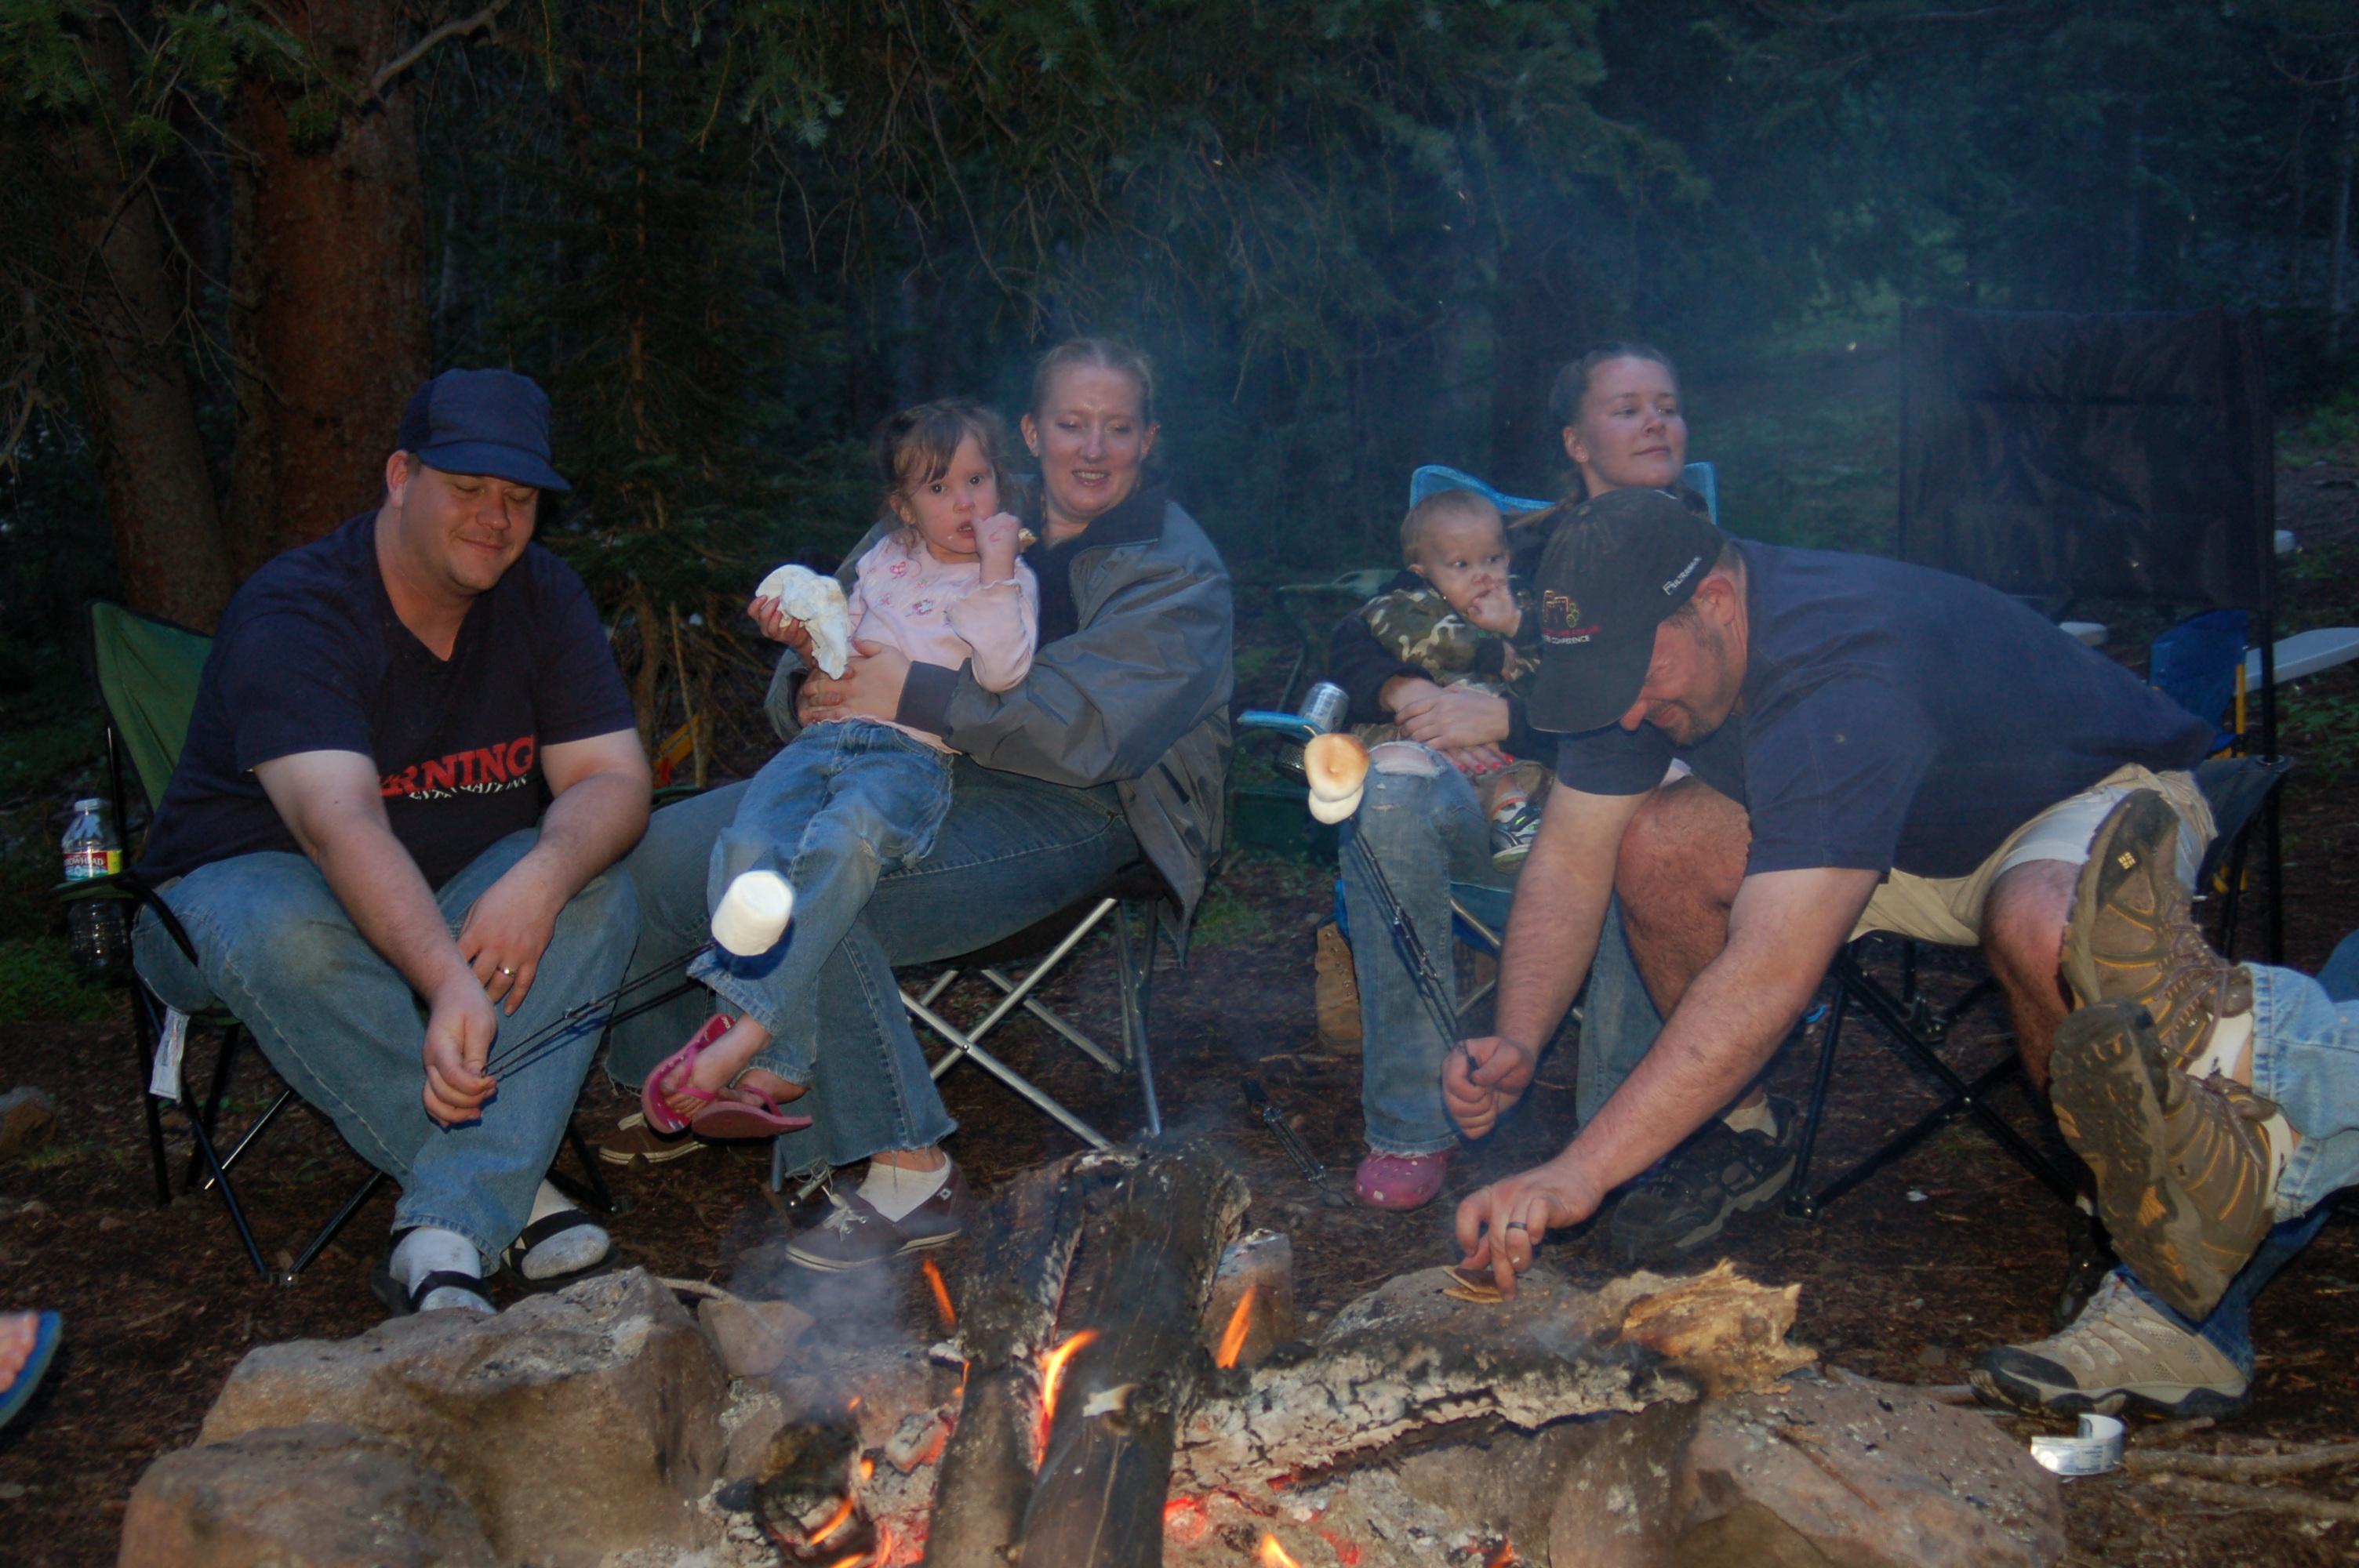 fantabulouswomen.com family by the fire